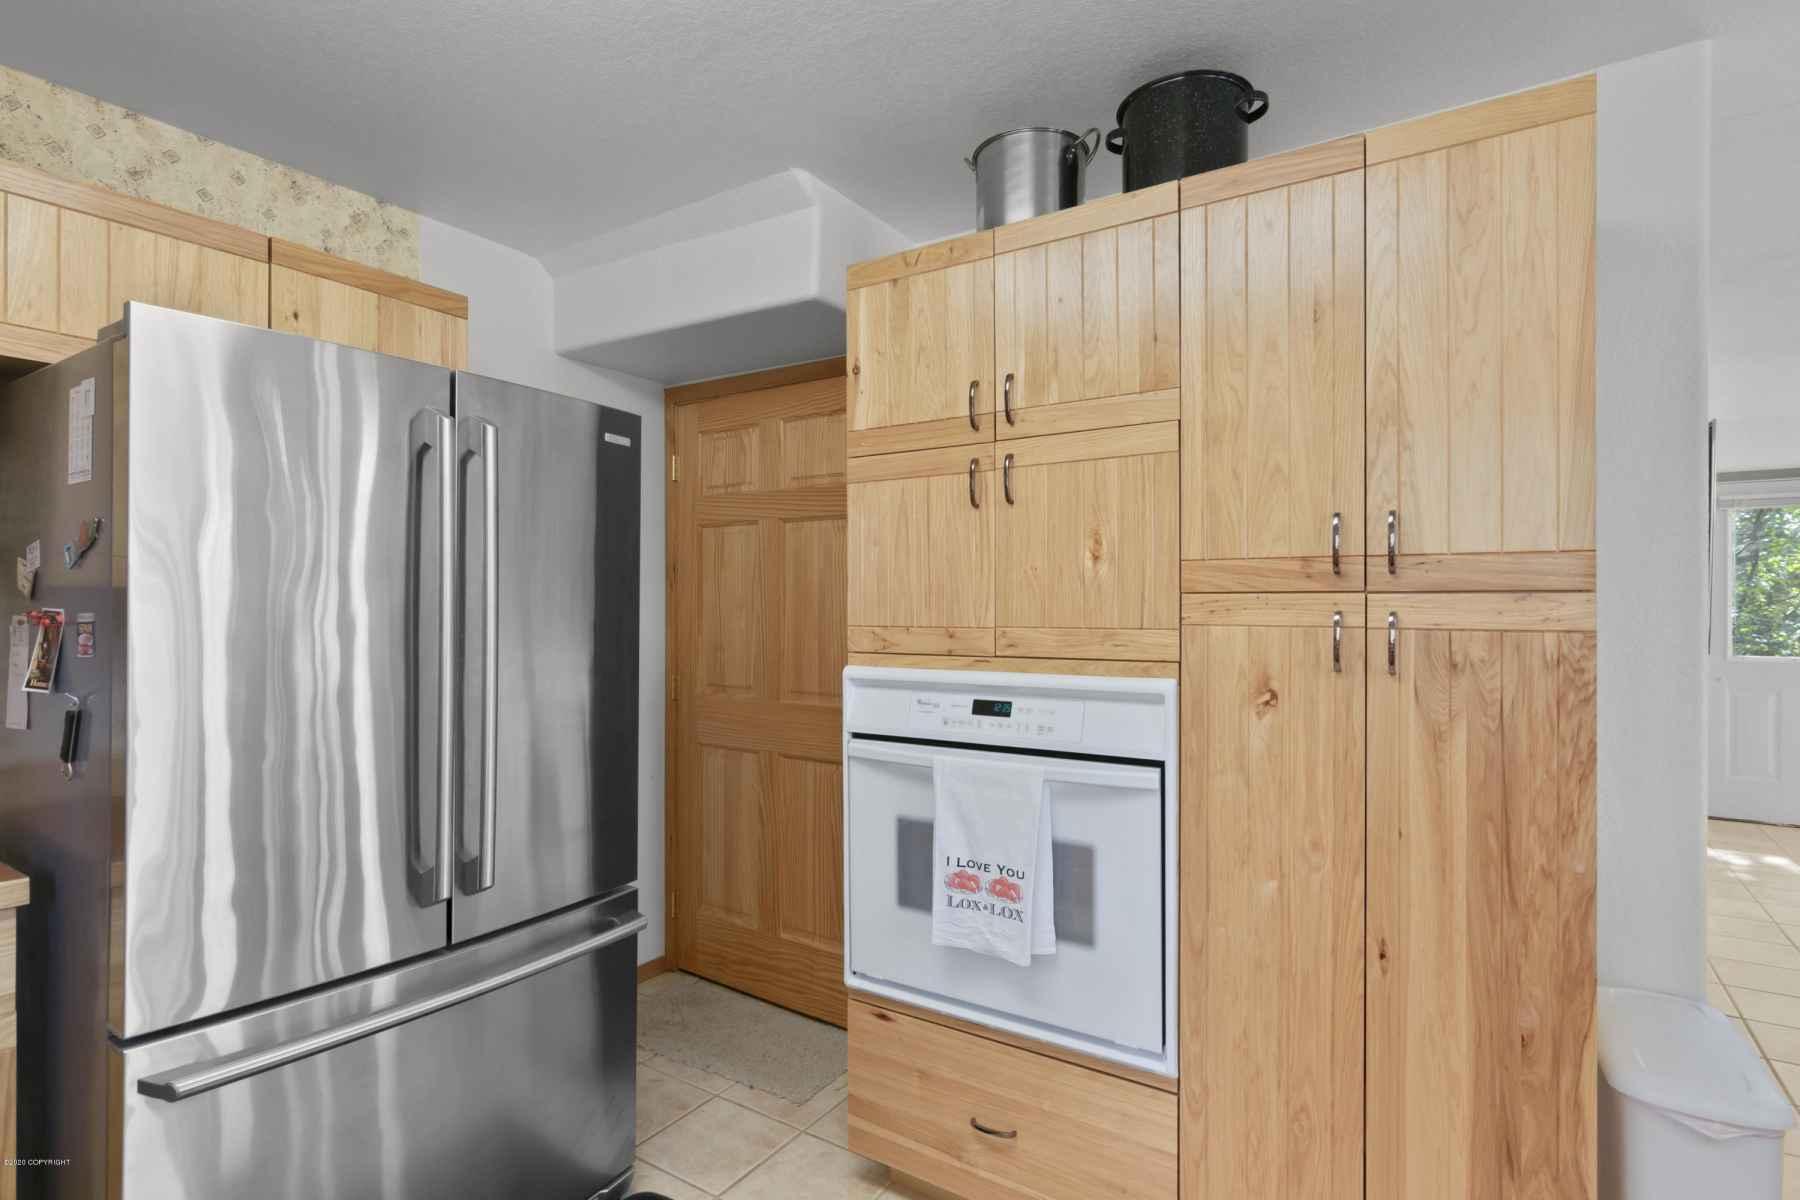 Refrigerator & Oven